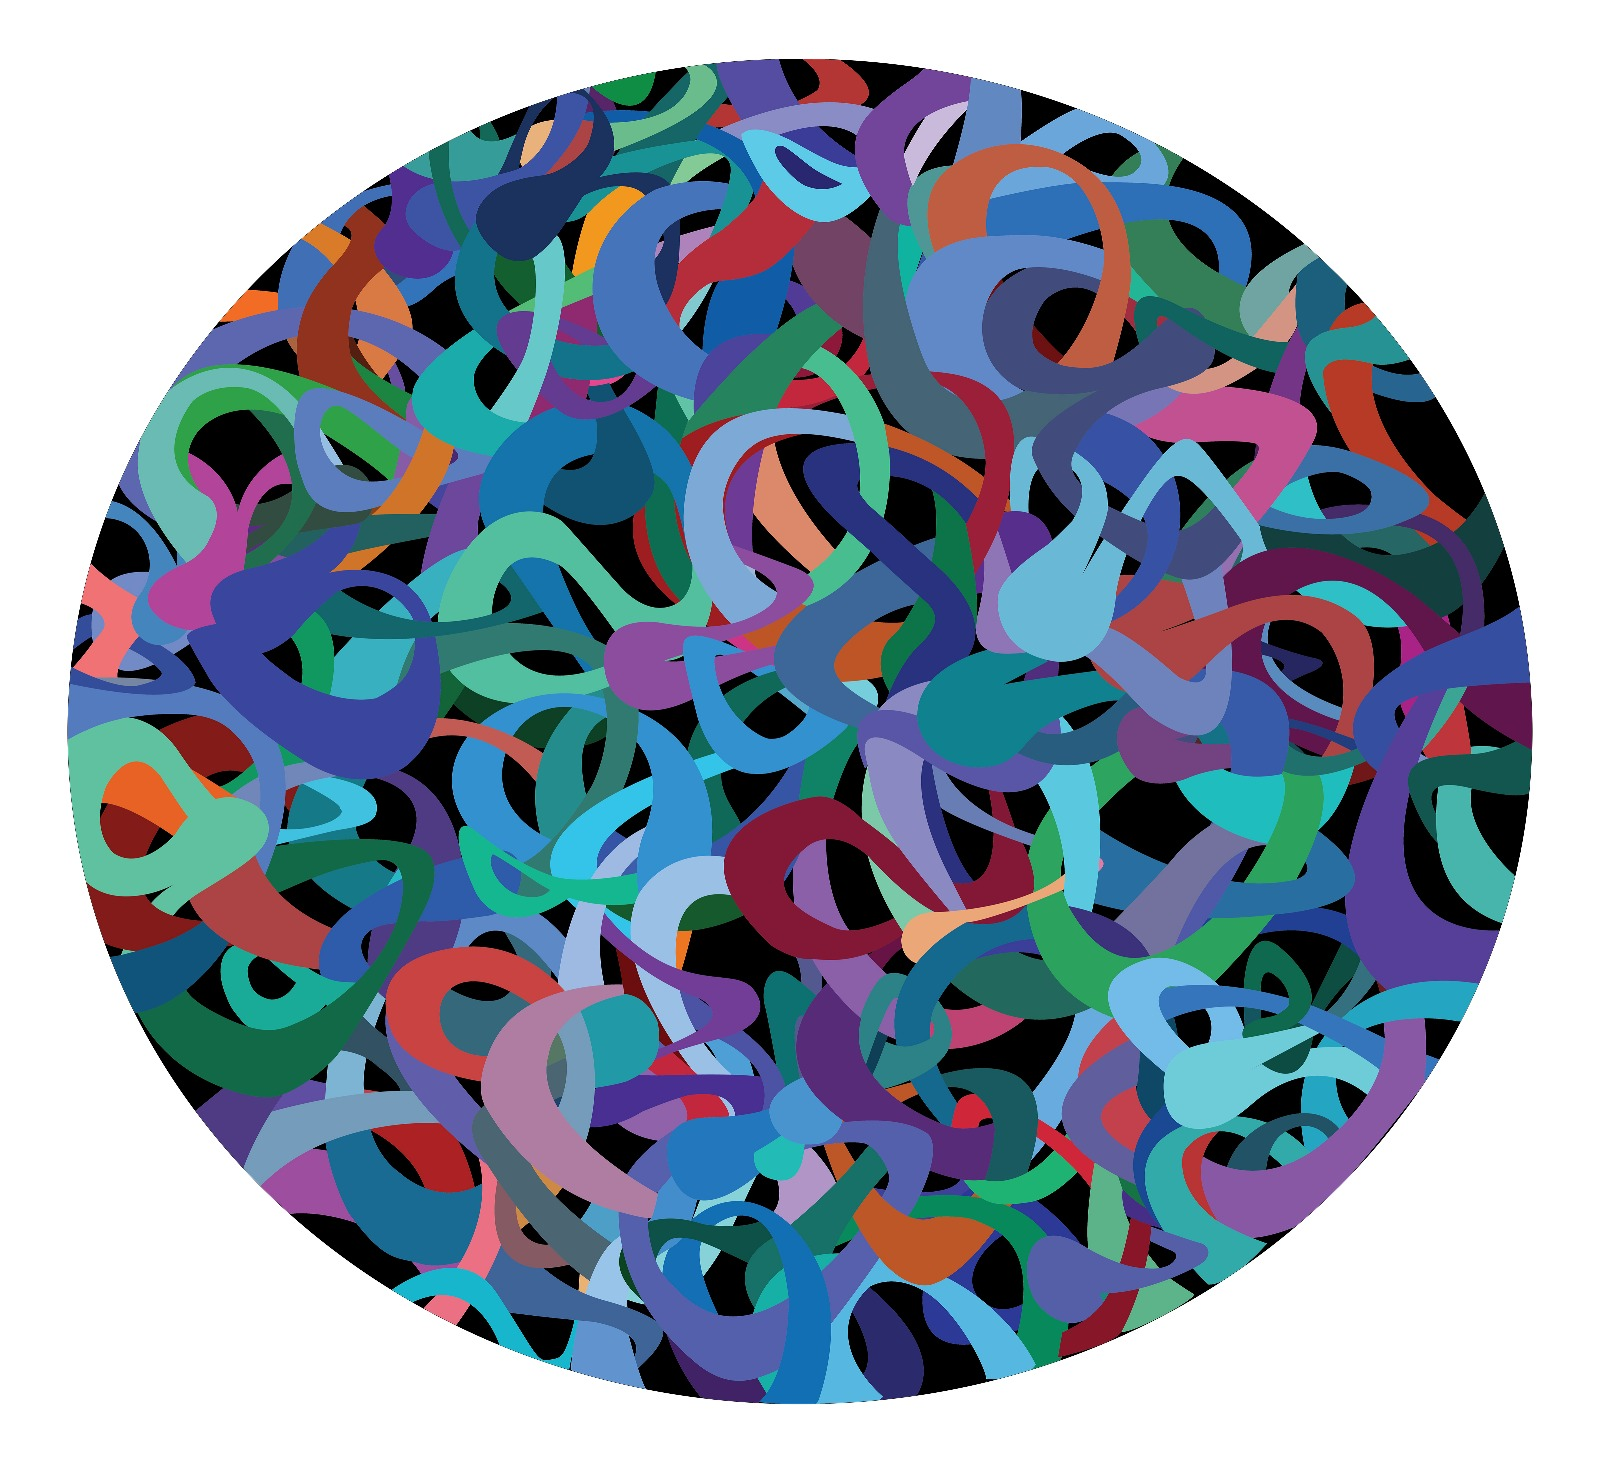 Digital Tangle #3